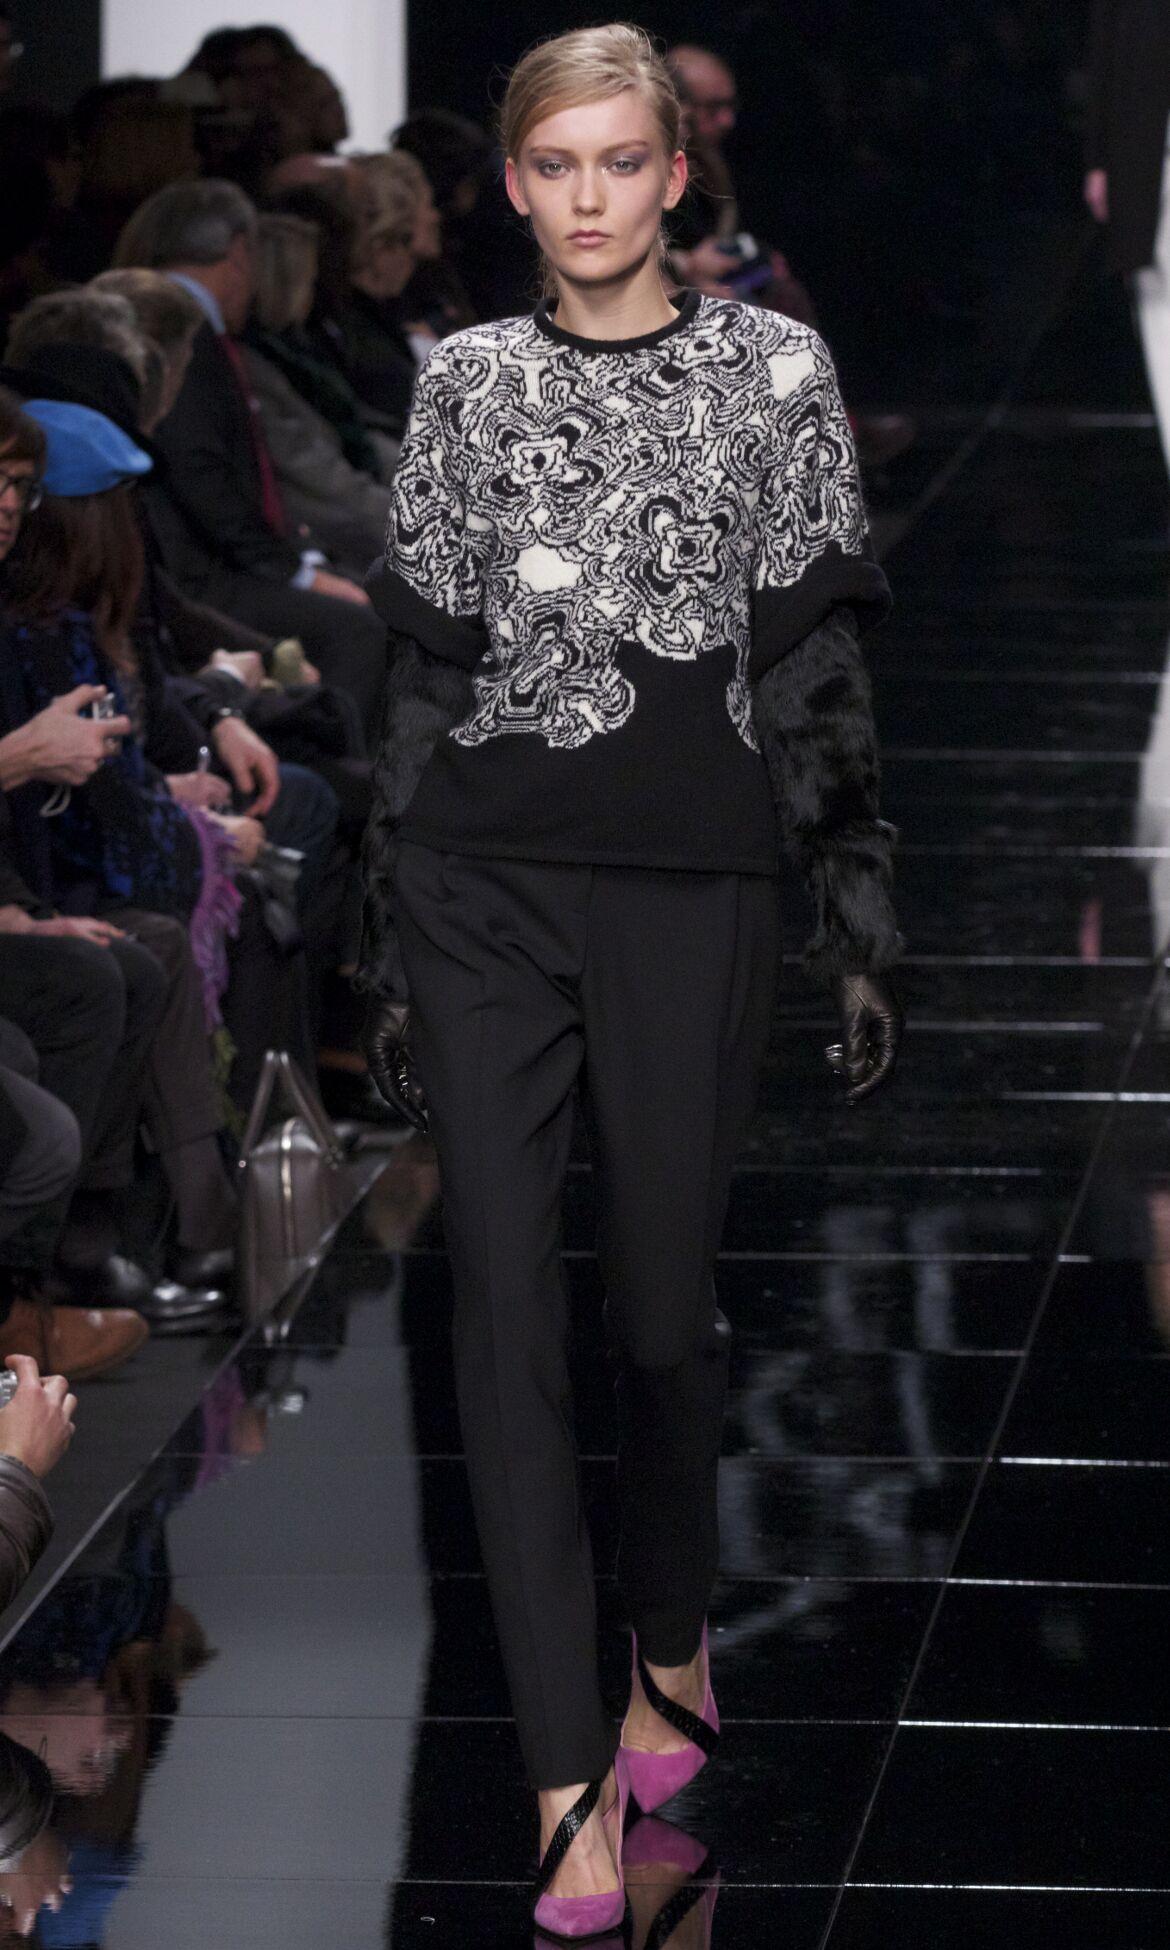 Iceberg Fashion Trends